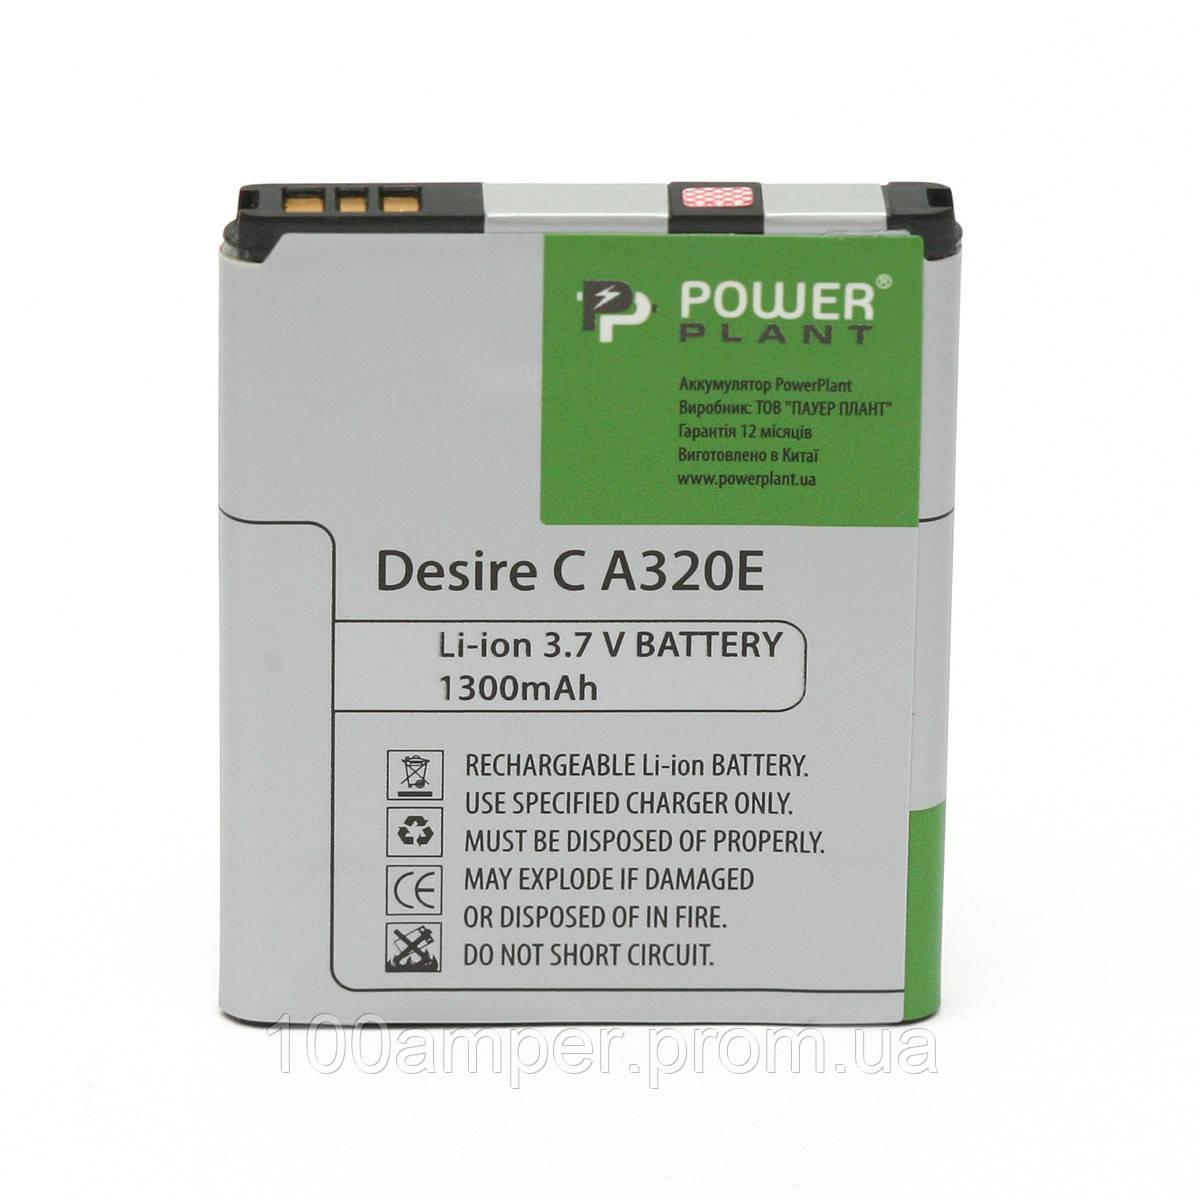 Аккумулятор PowerPlant HTC Desire C A320E (BA S850) 1300mAh